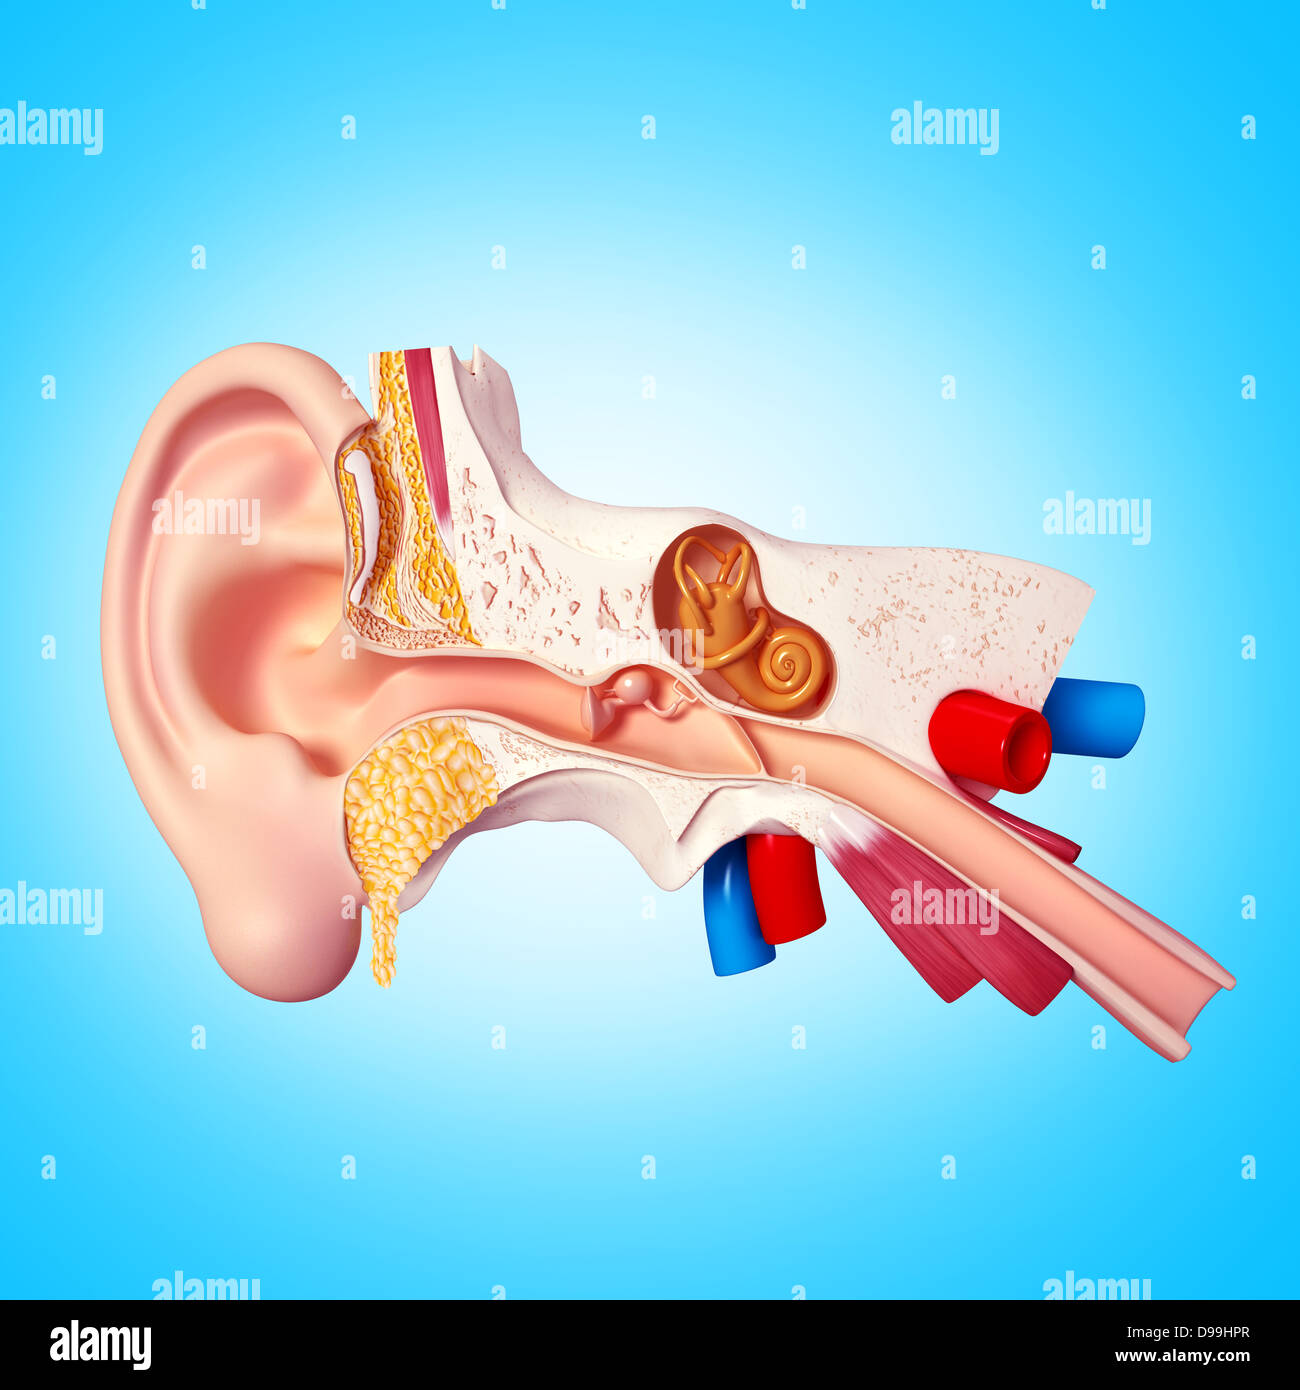 3D illustration of Human Ear anatomy Stock Photo: 57374543 - Alamy